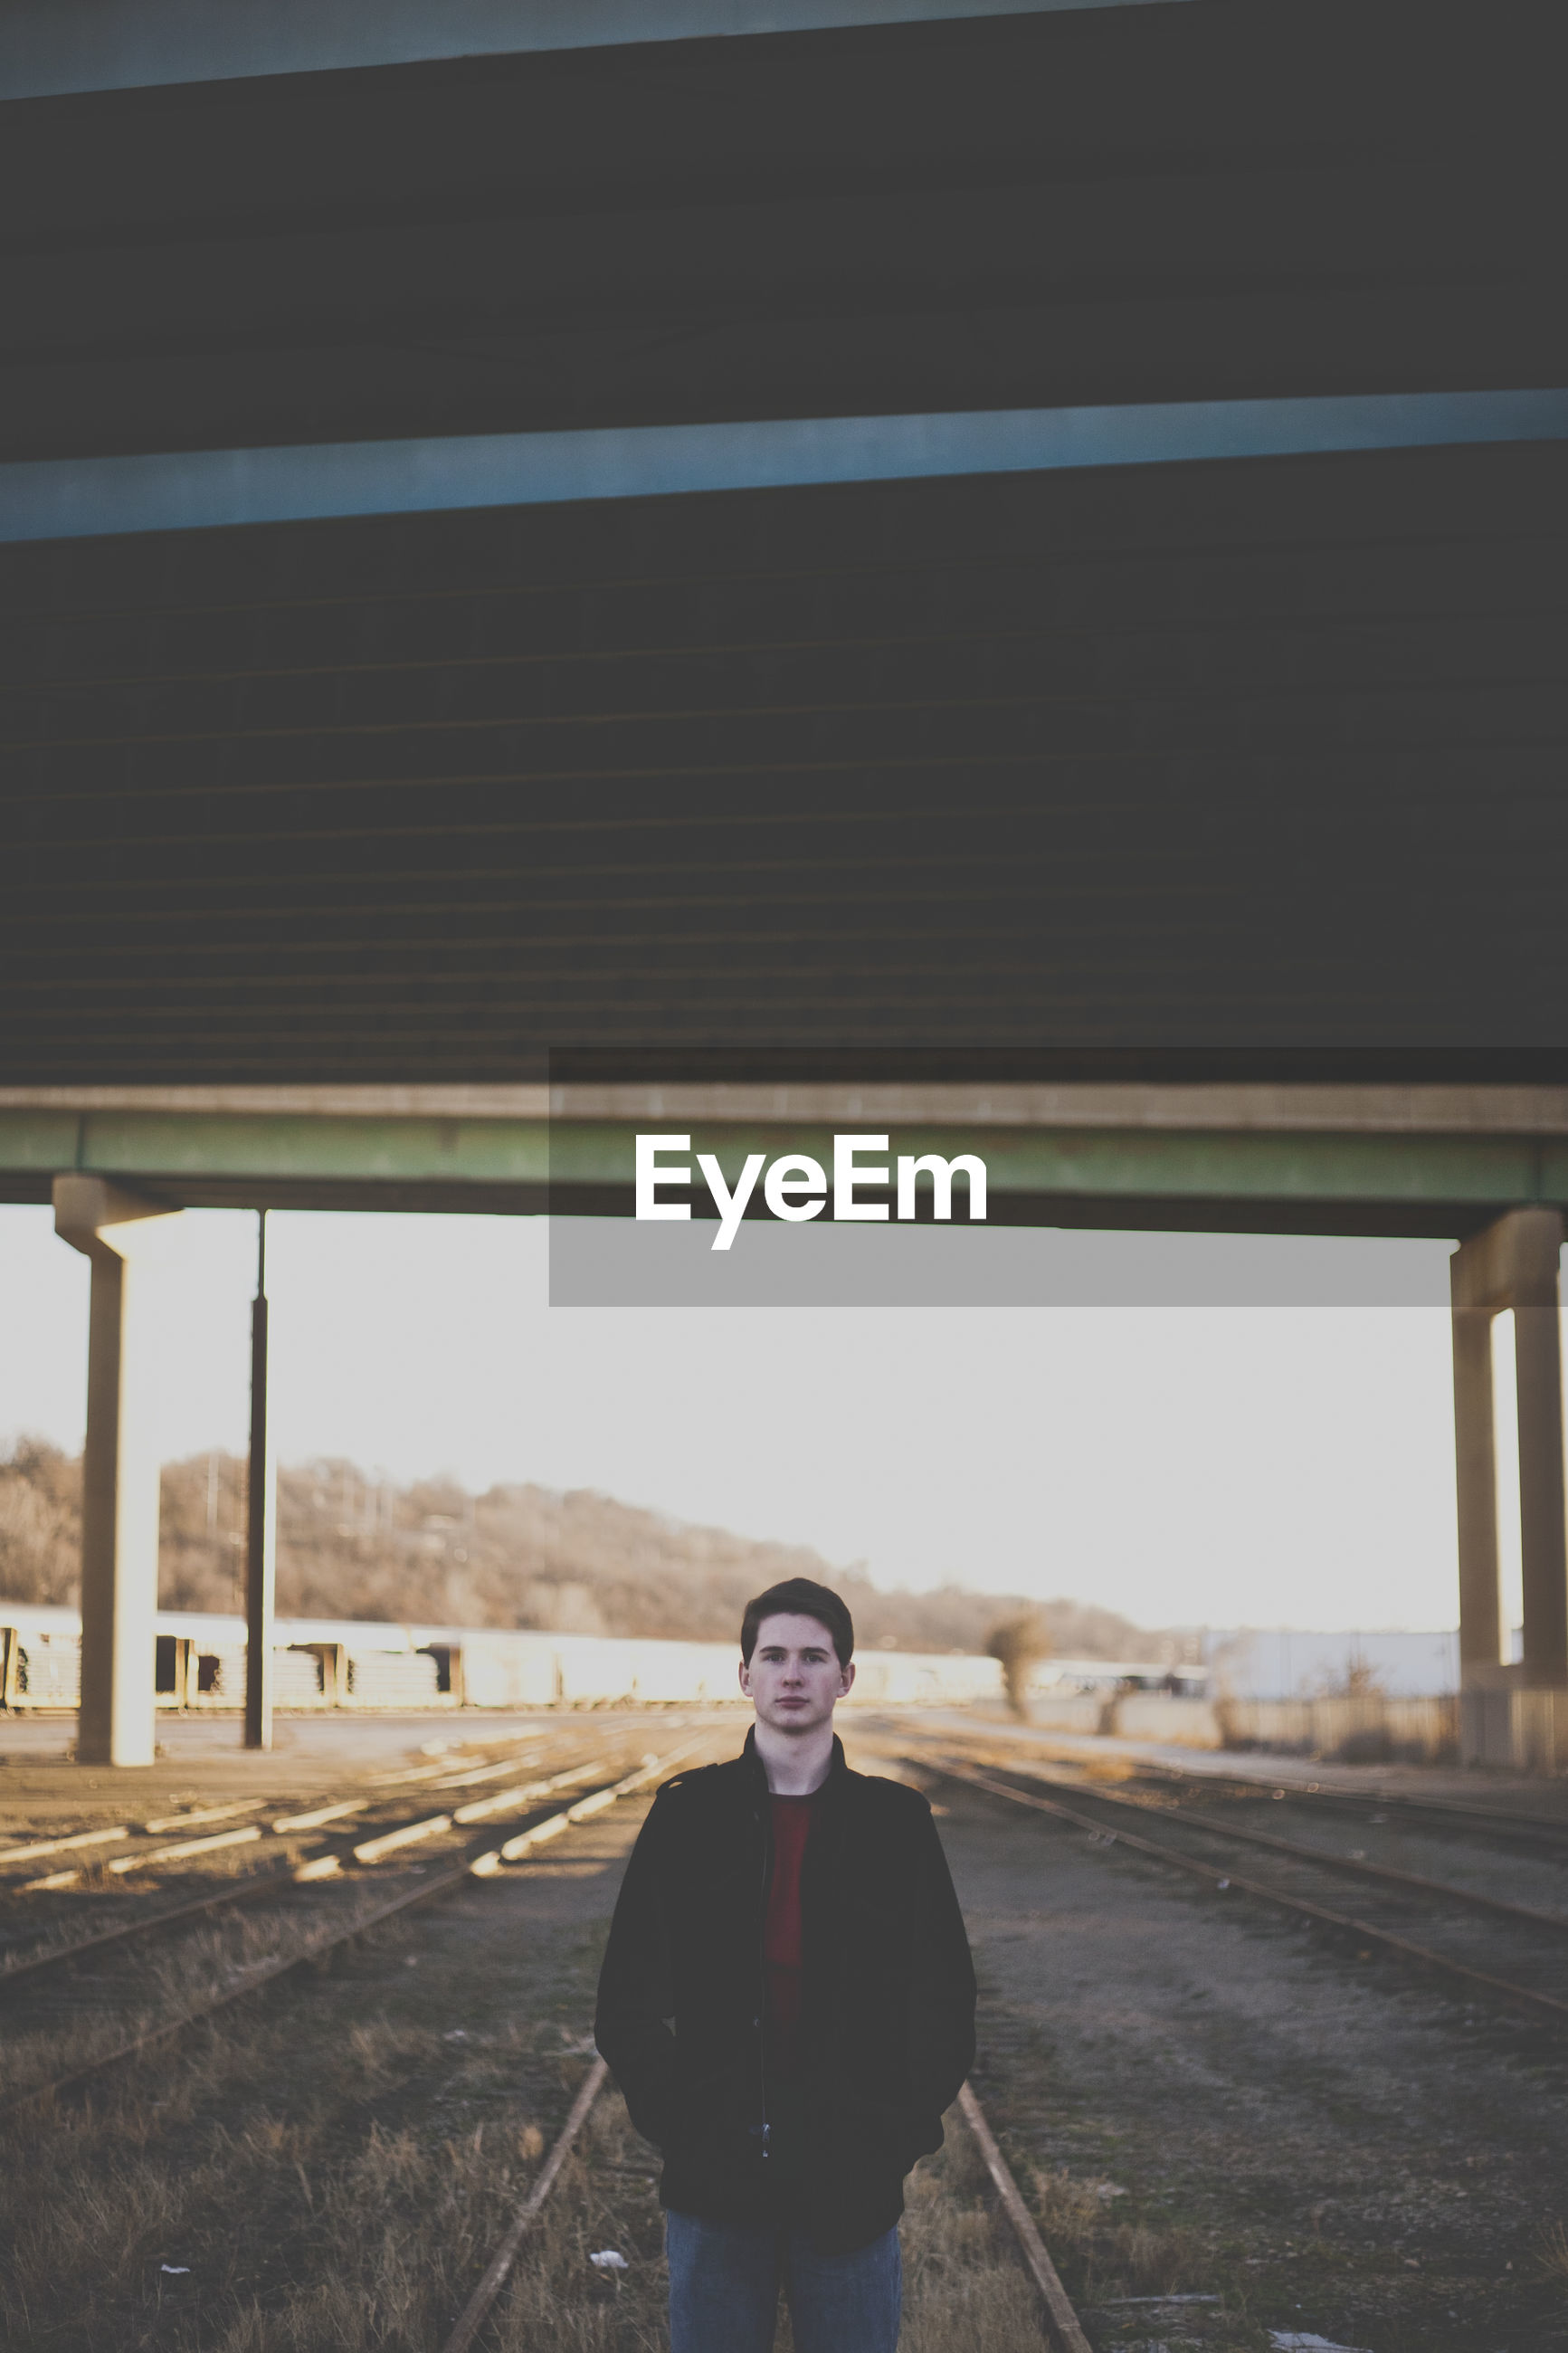 Portrait of handsome man standing at abandoned tracks